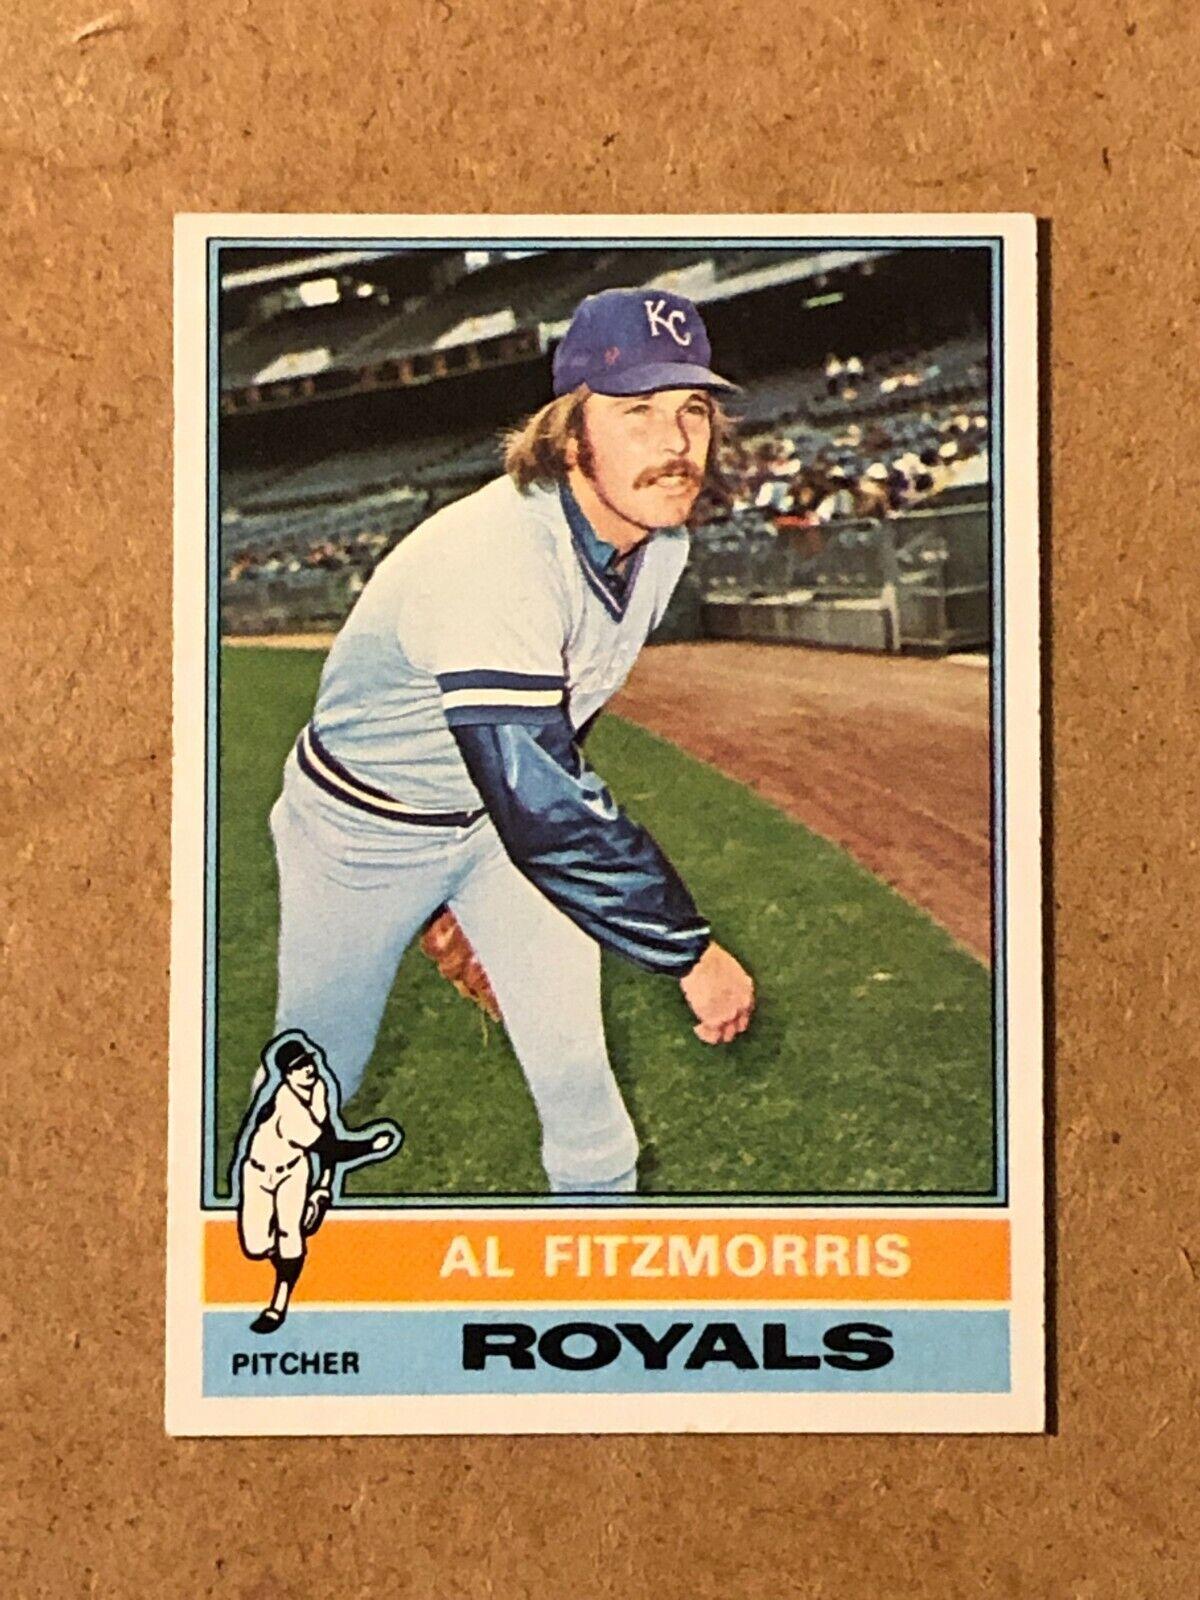 1976 Topps Al Fitzmorris 144 EX - $1.74